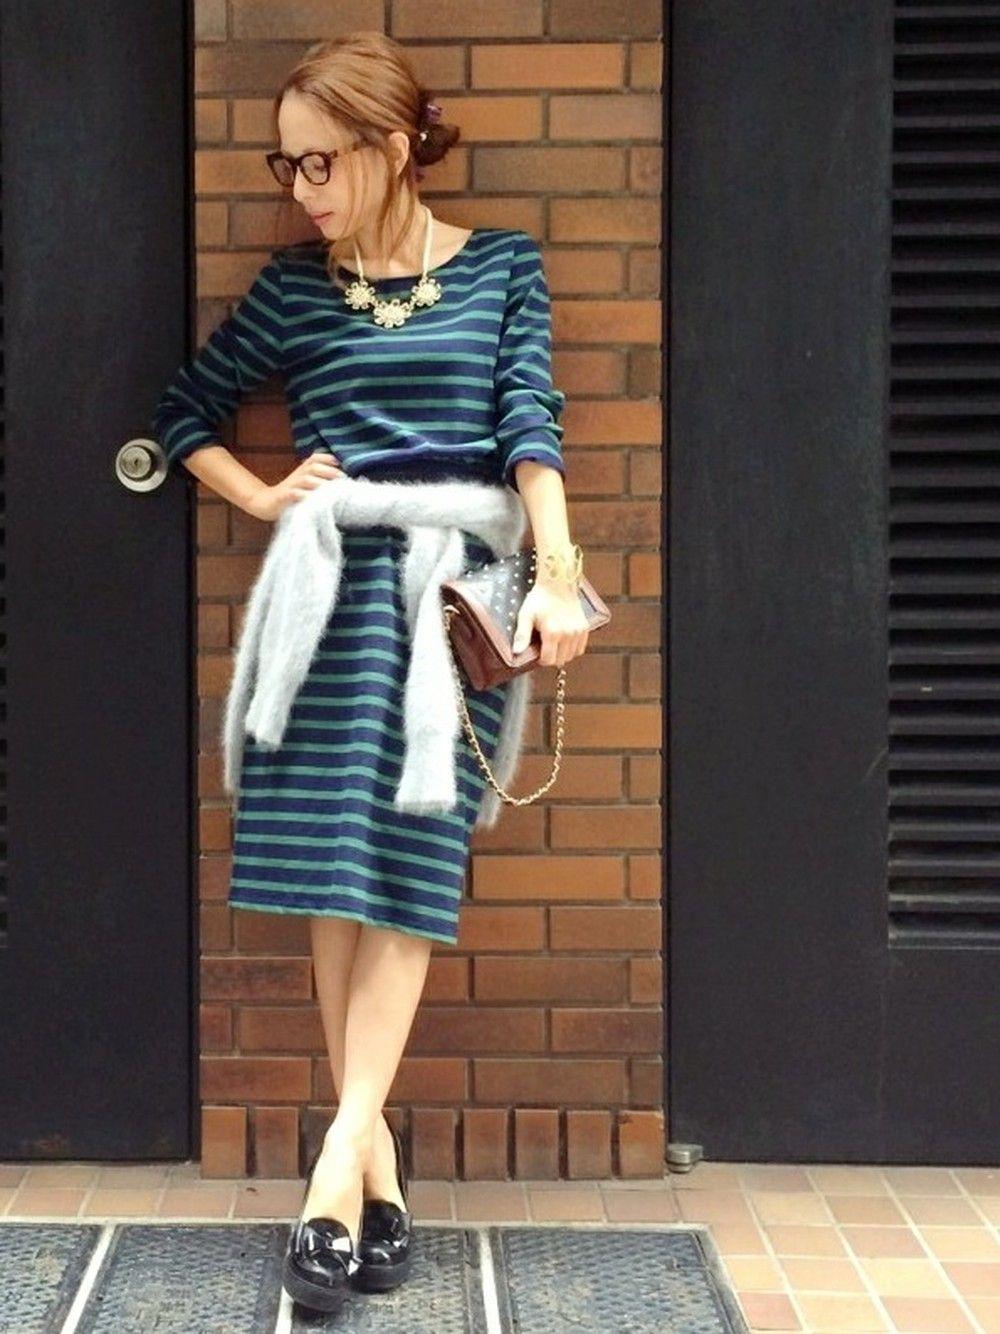 YUUKIさんのワンピース「amie by miely ボーダーワンピース」を使ったコーディネート